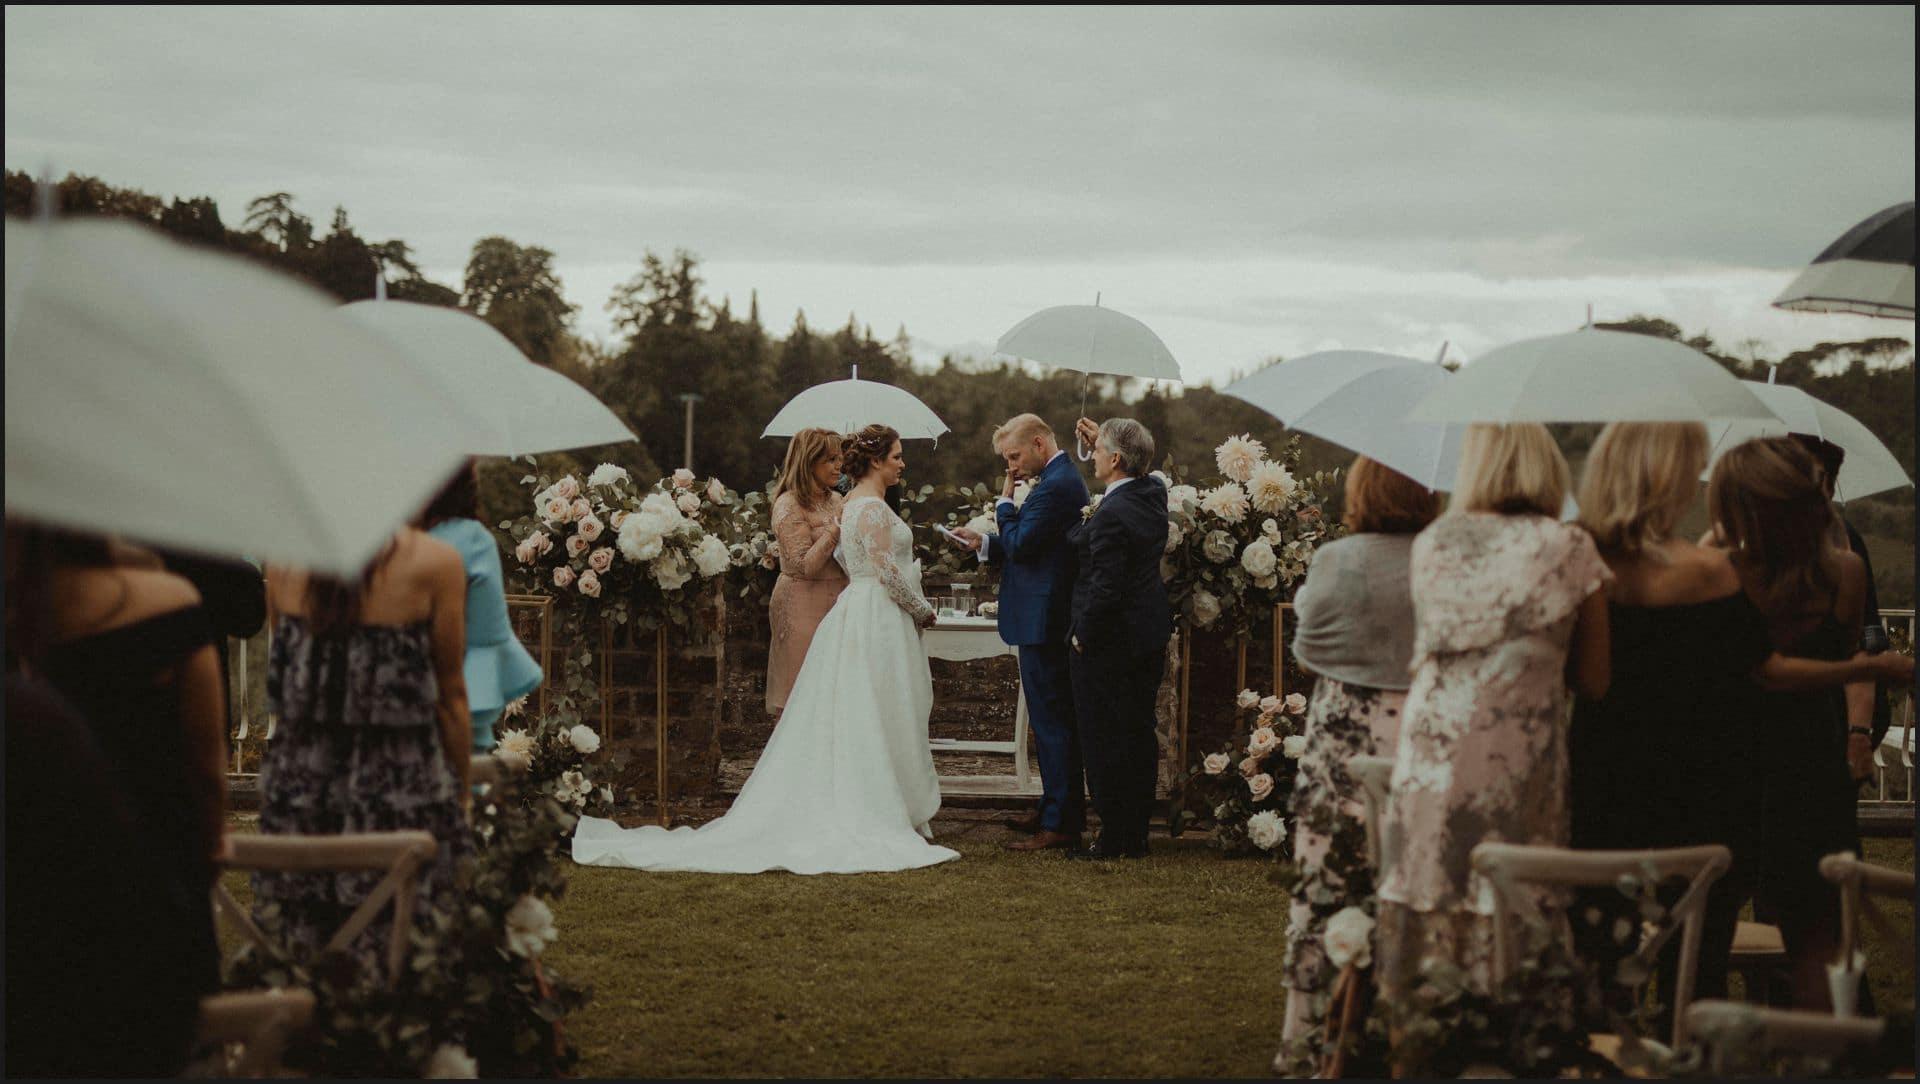 tuscany, destination wedding, chianti, wedding ceremony, torre del chianti